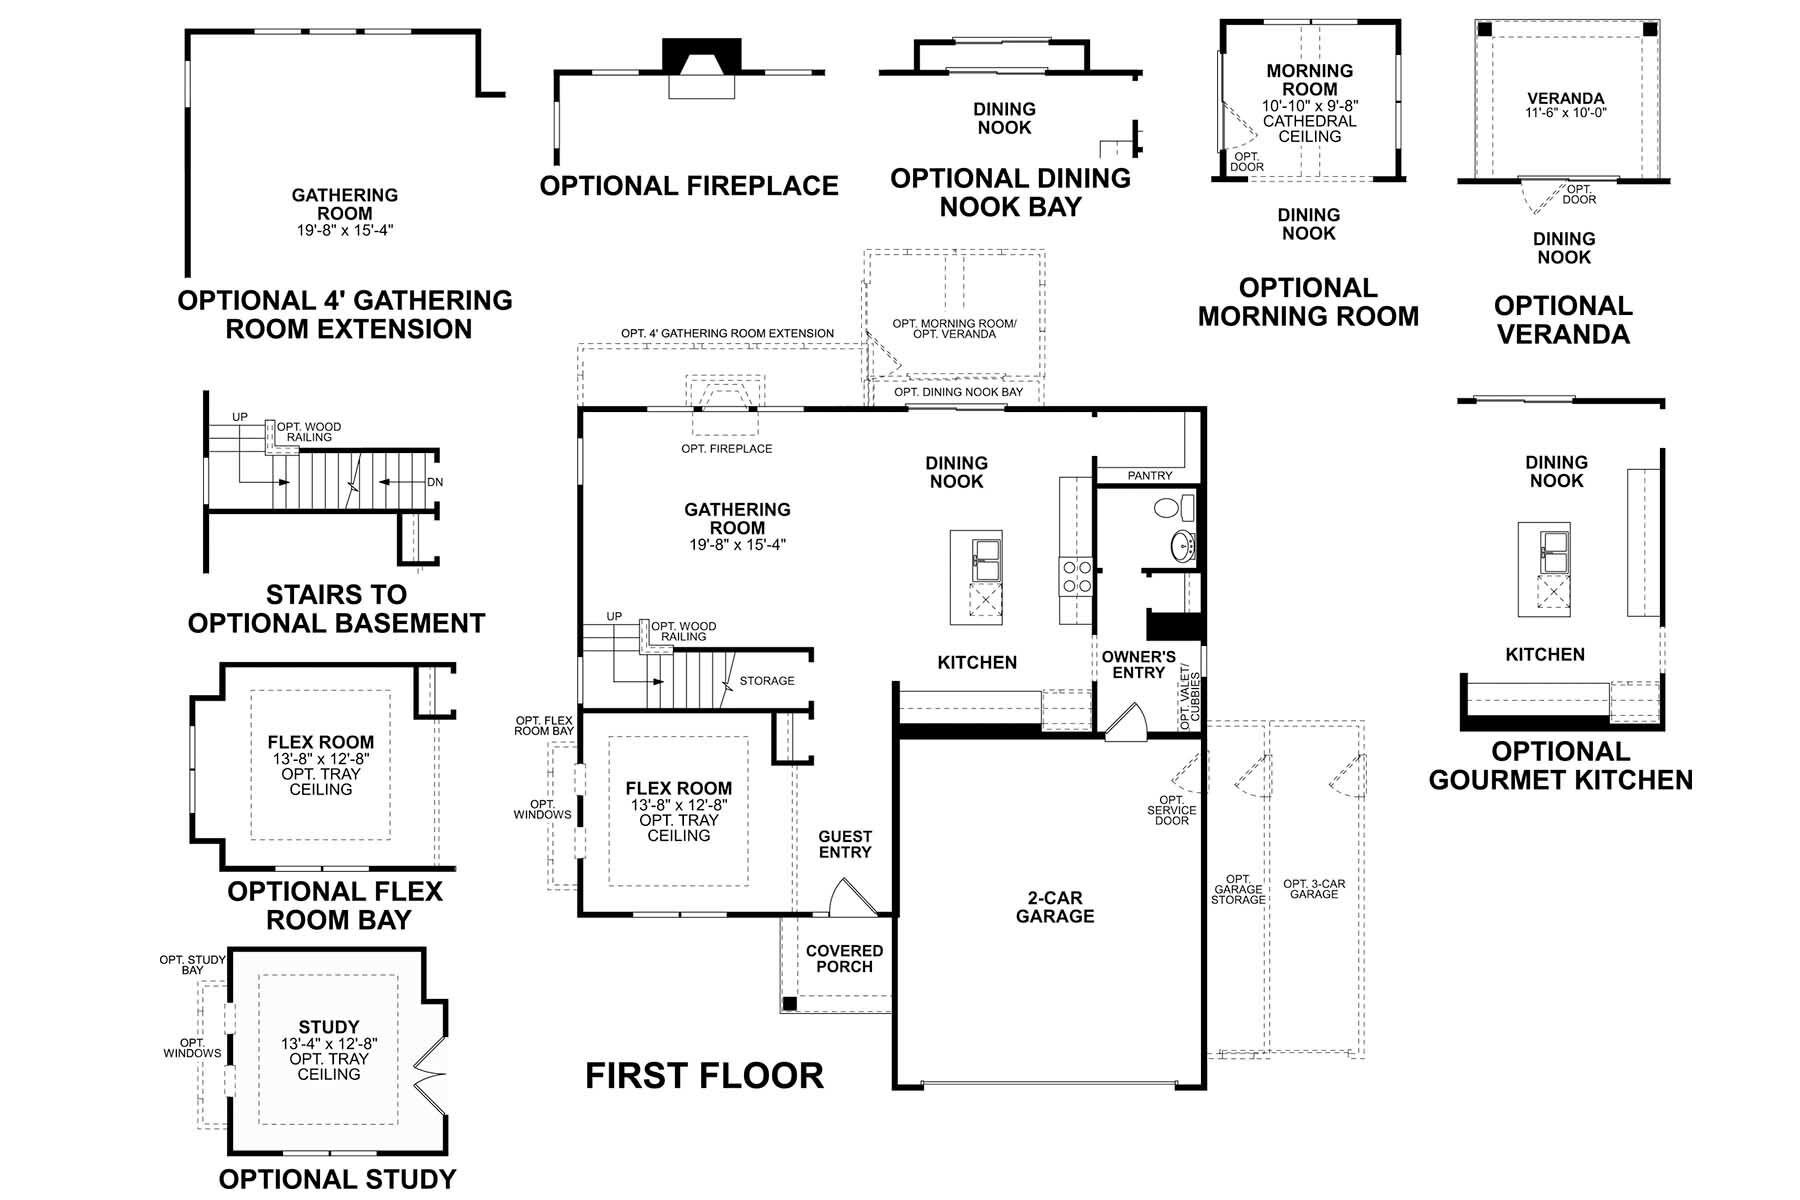 Cahill First Floor